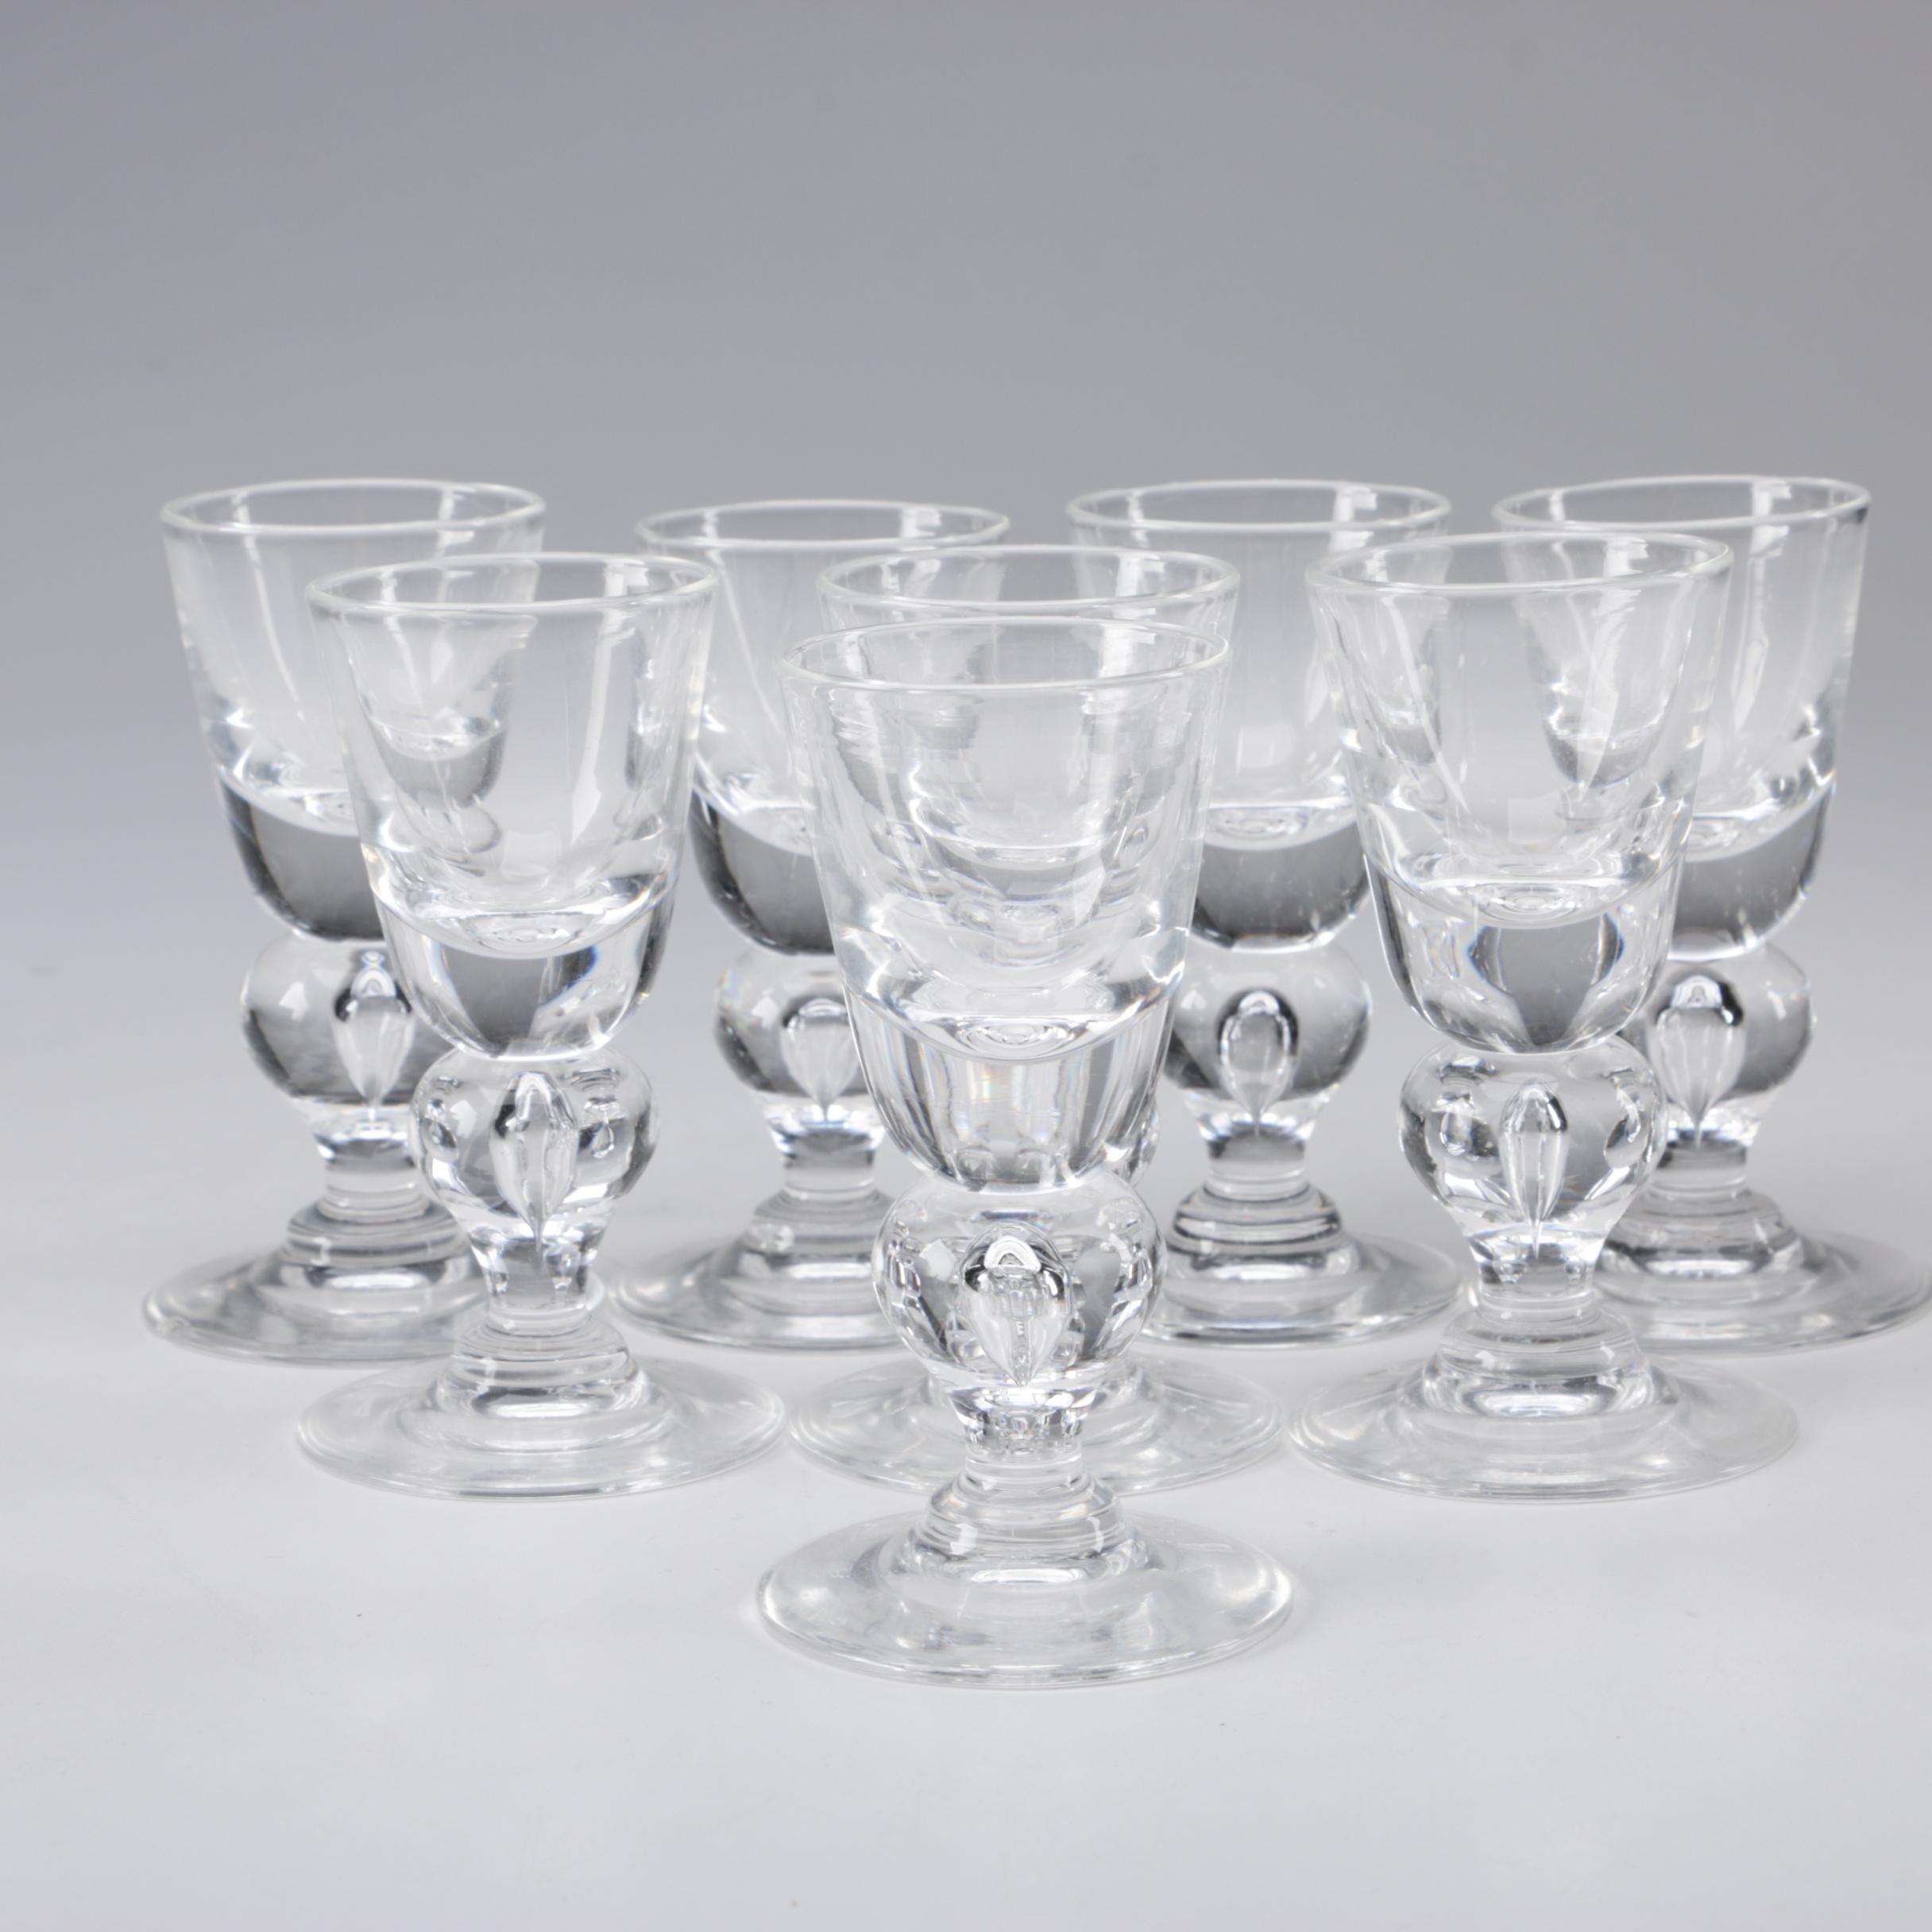 Steuben Art Glass Cordial Glasses Designed by George Thompson, Circa 1940s